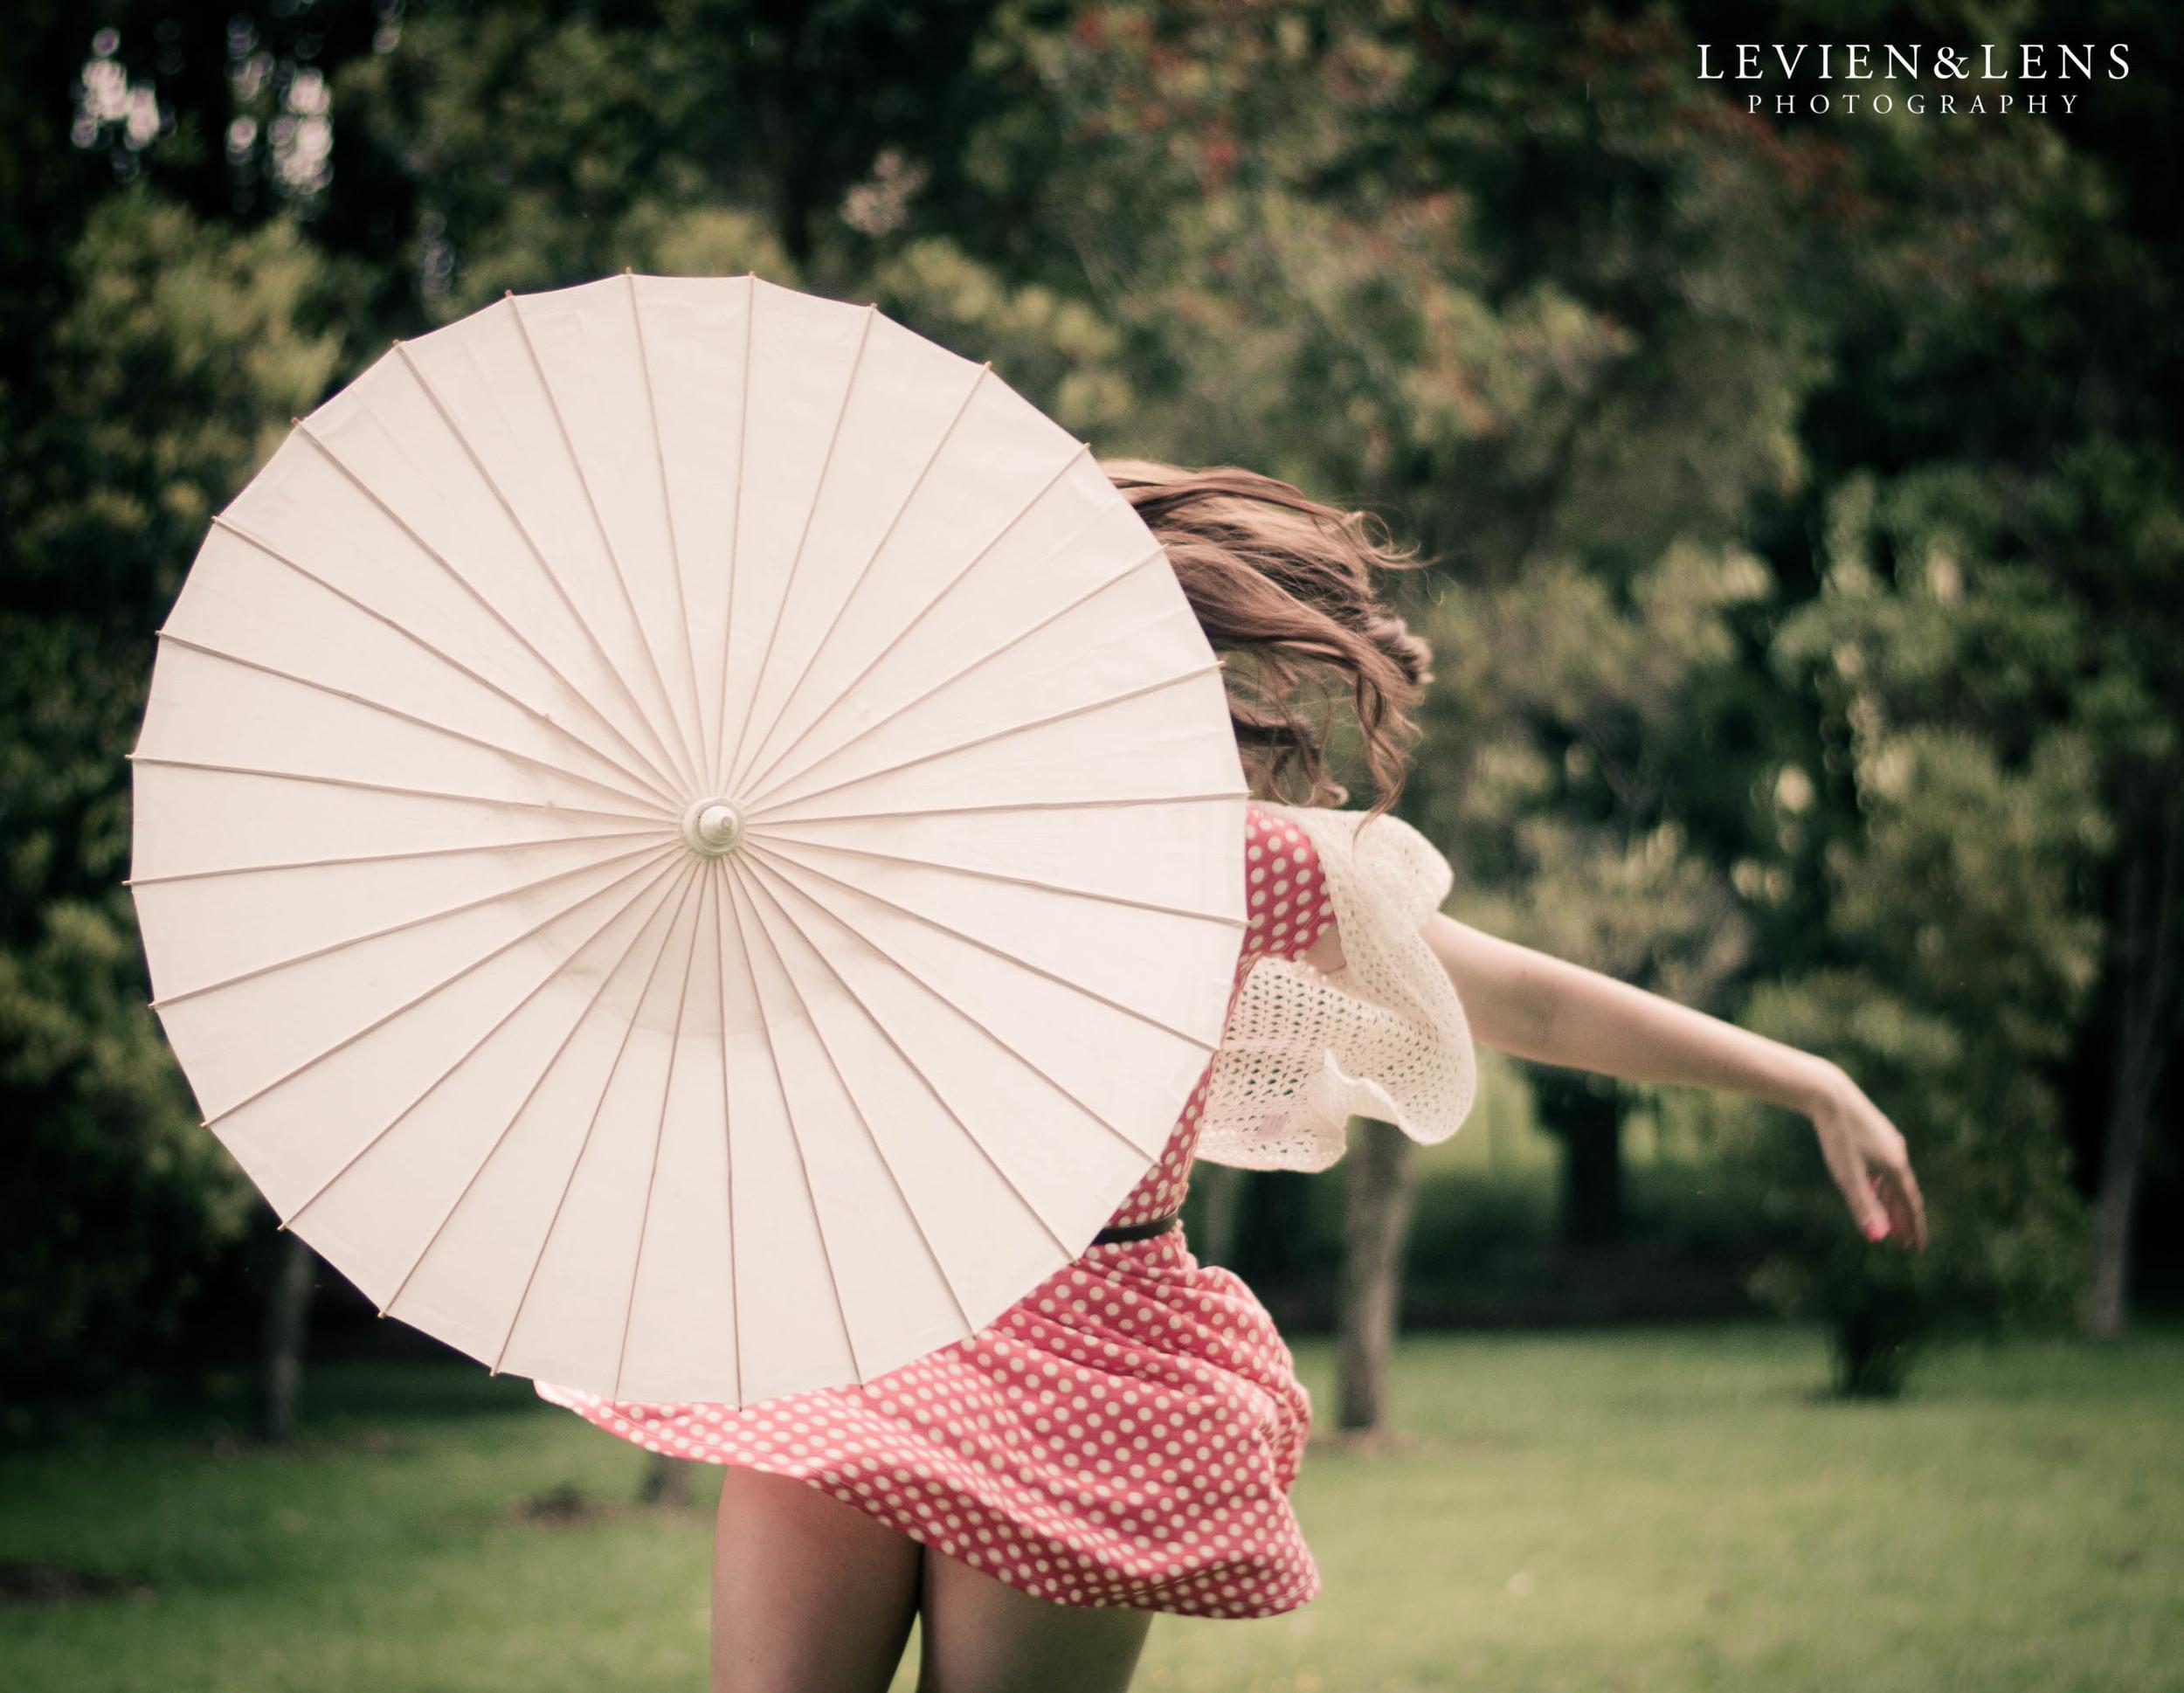 dance with umbrella